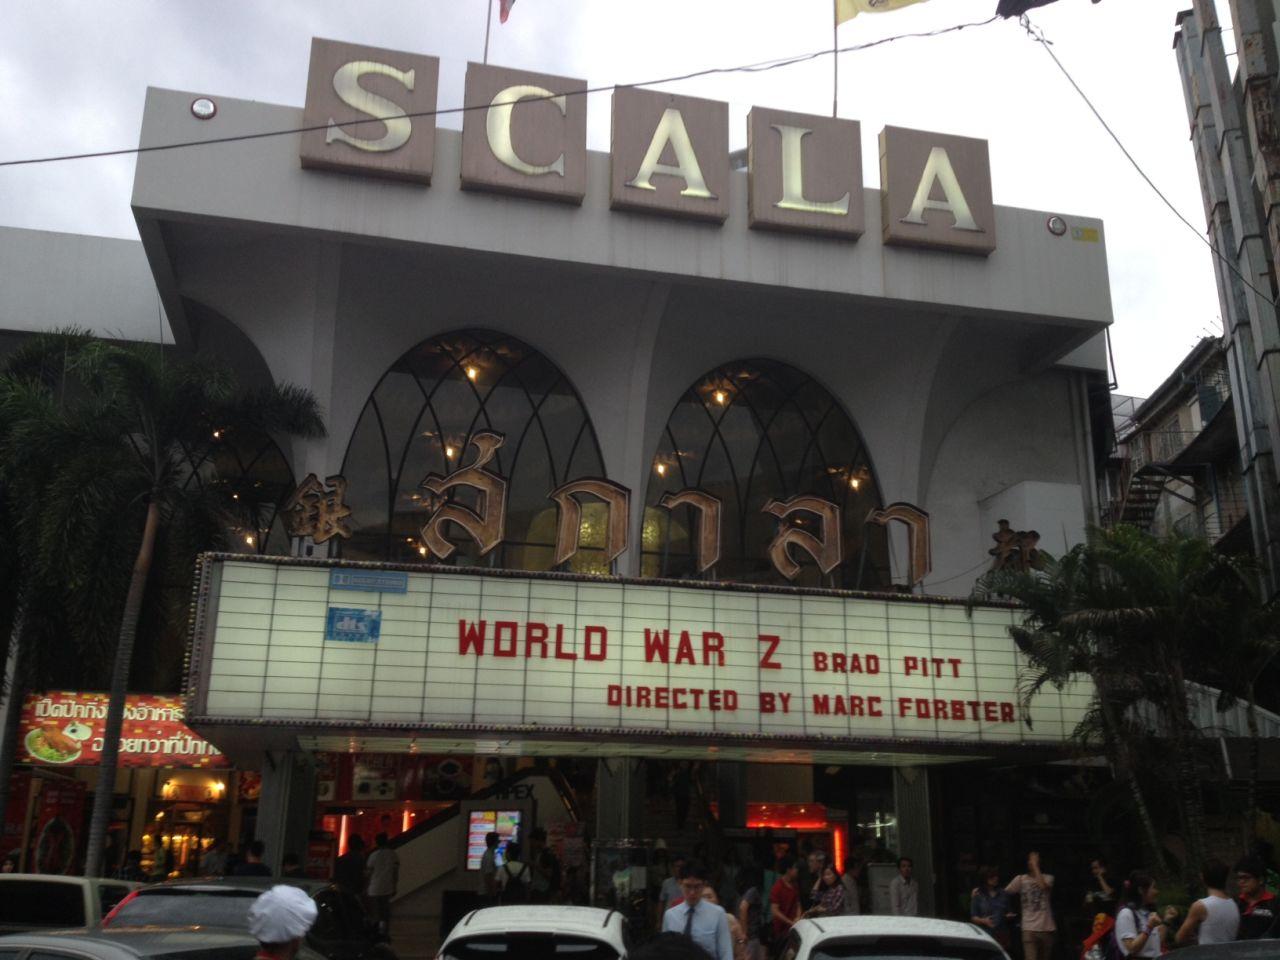 Scala 2